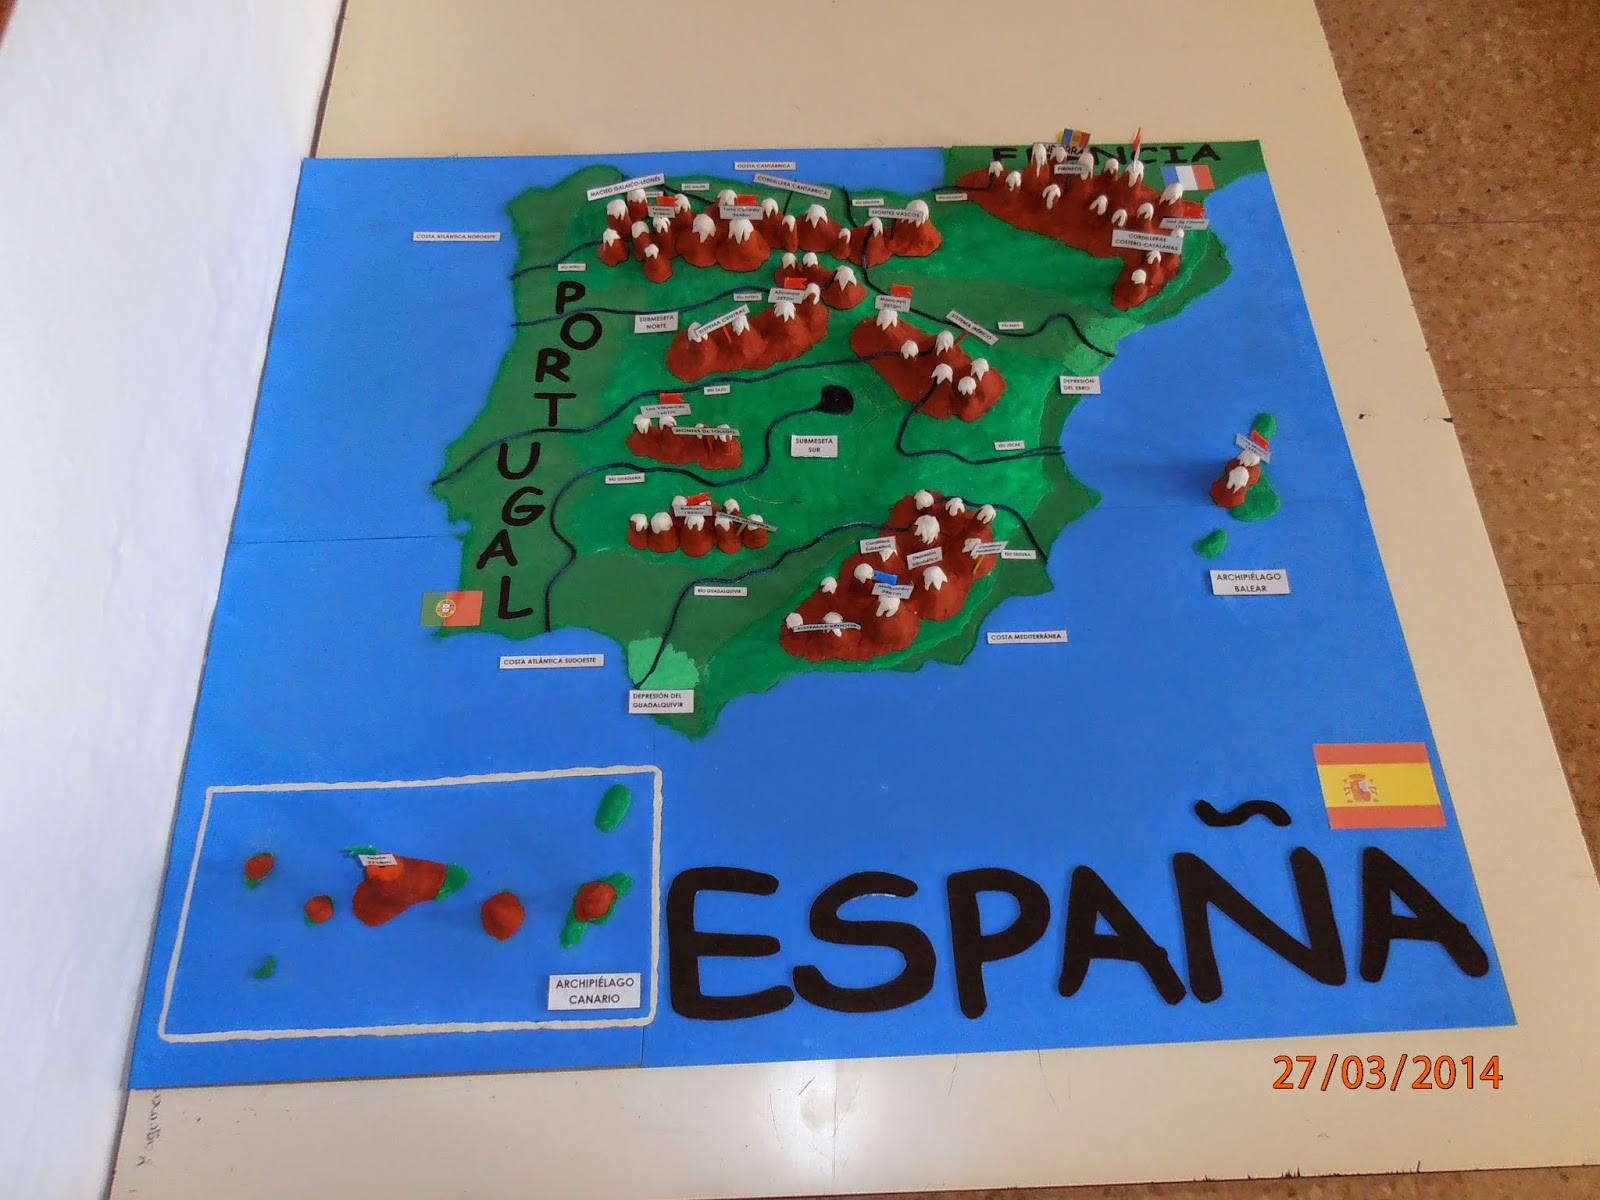 Blog de Geografa del profesor Juan Martn Martn Otras formas de